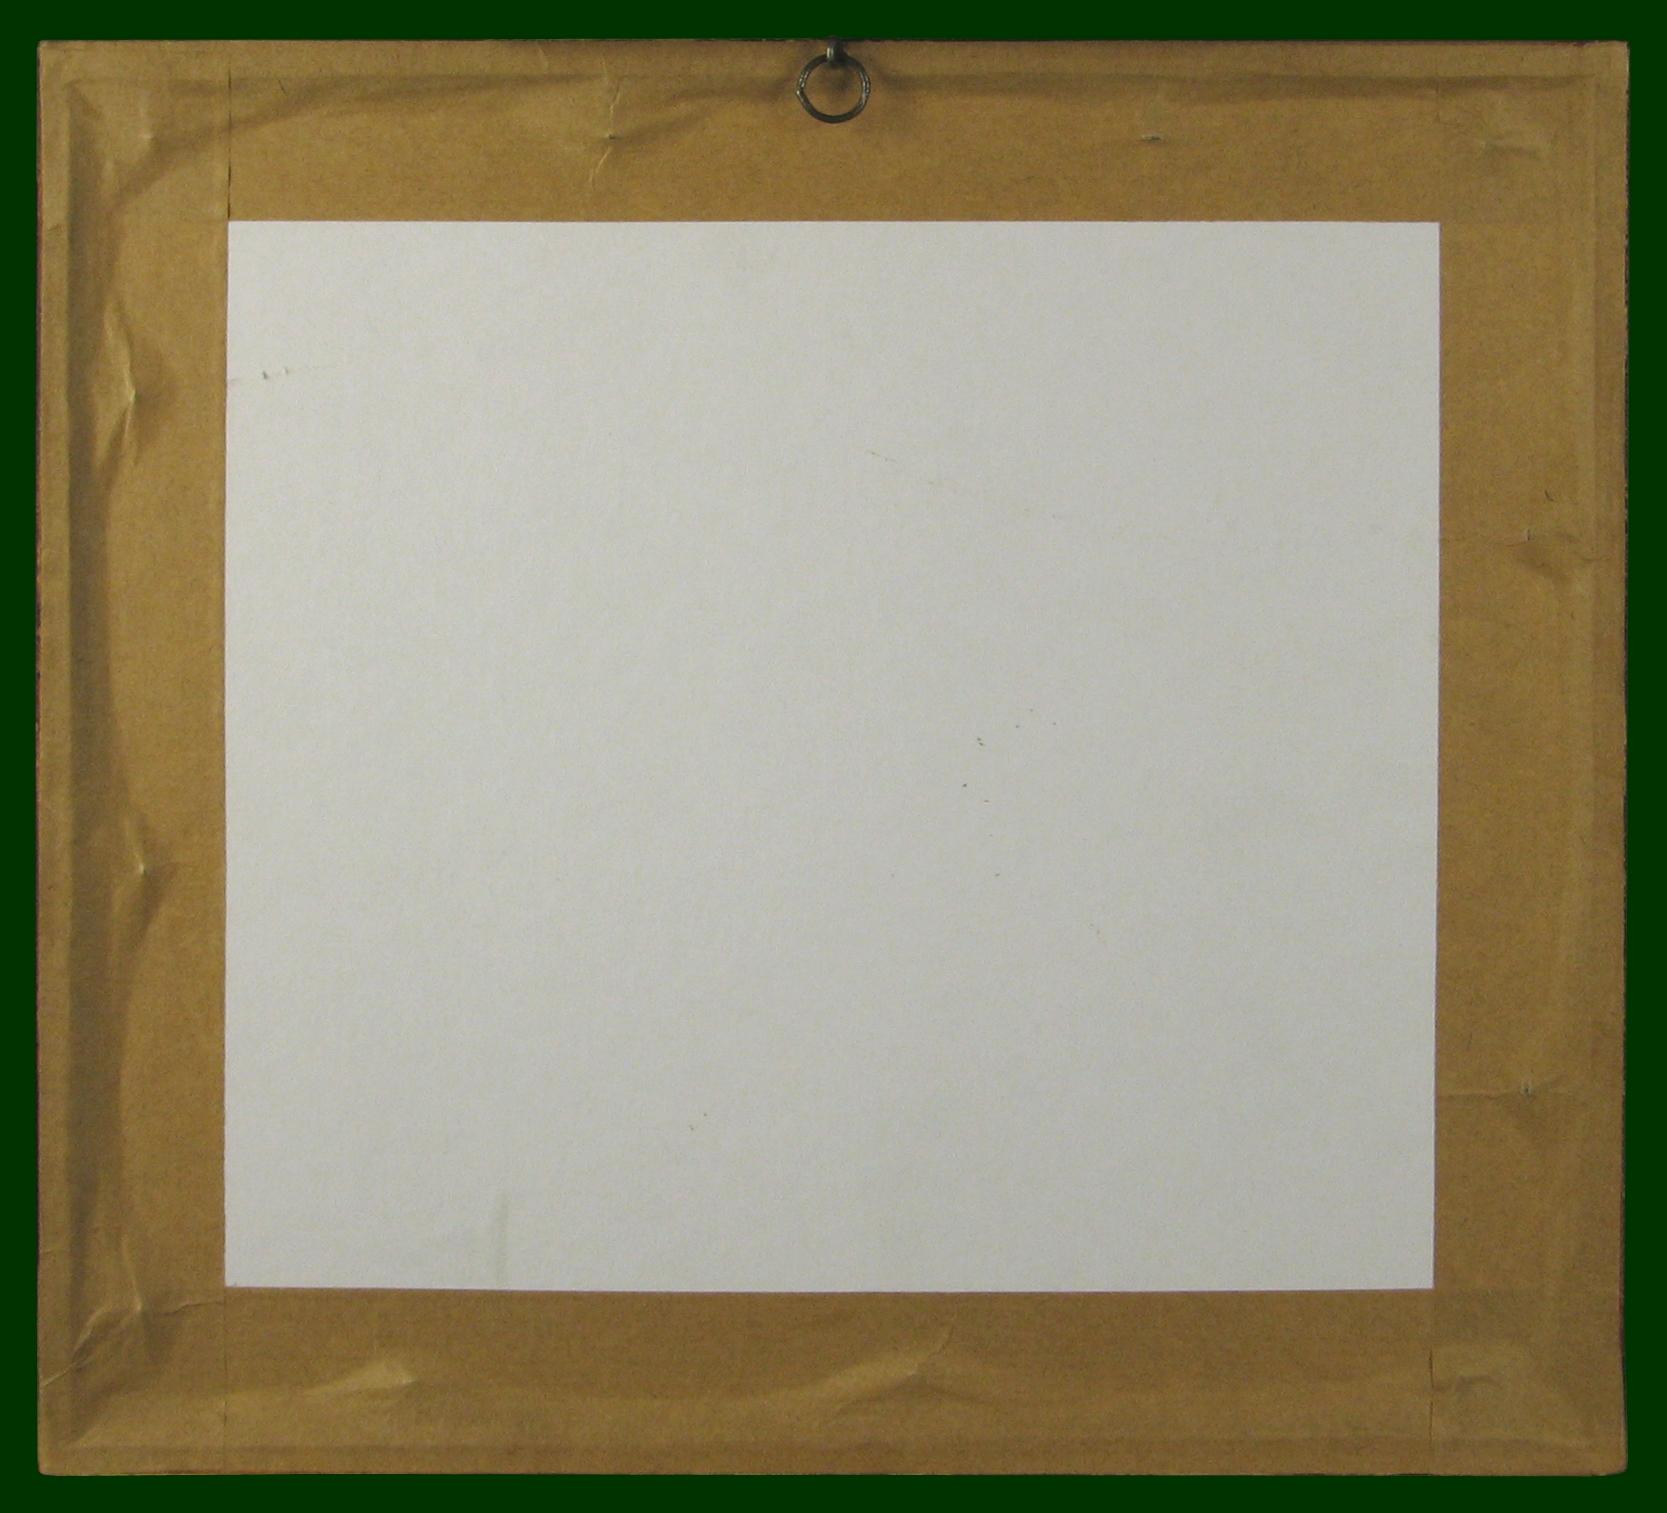 101-12h_t.jpg (1667×1513)